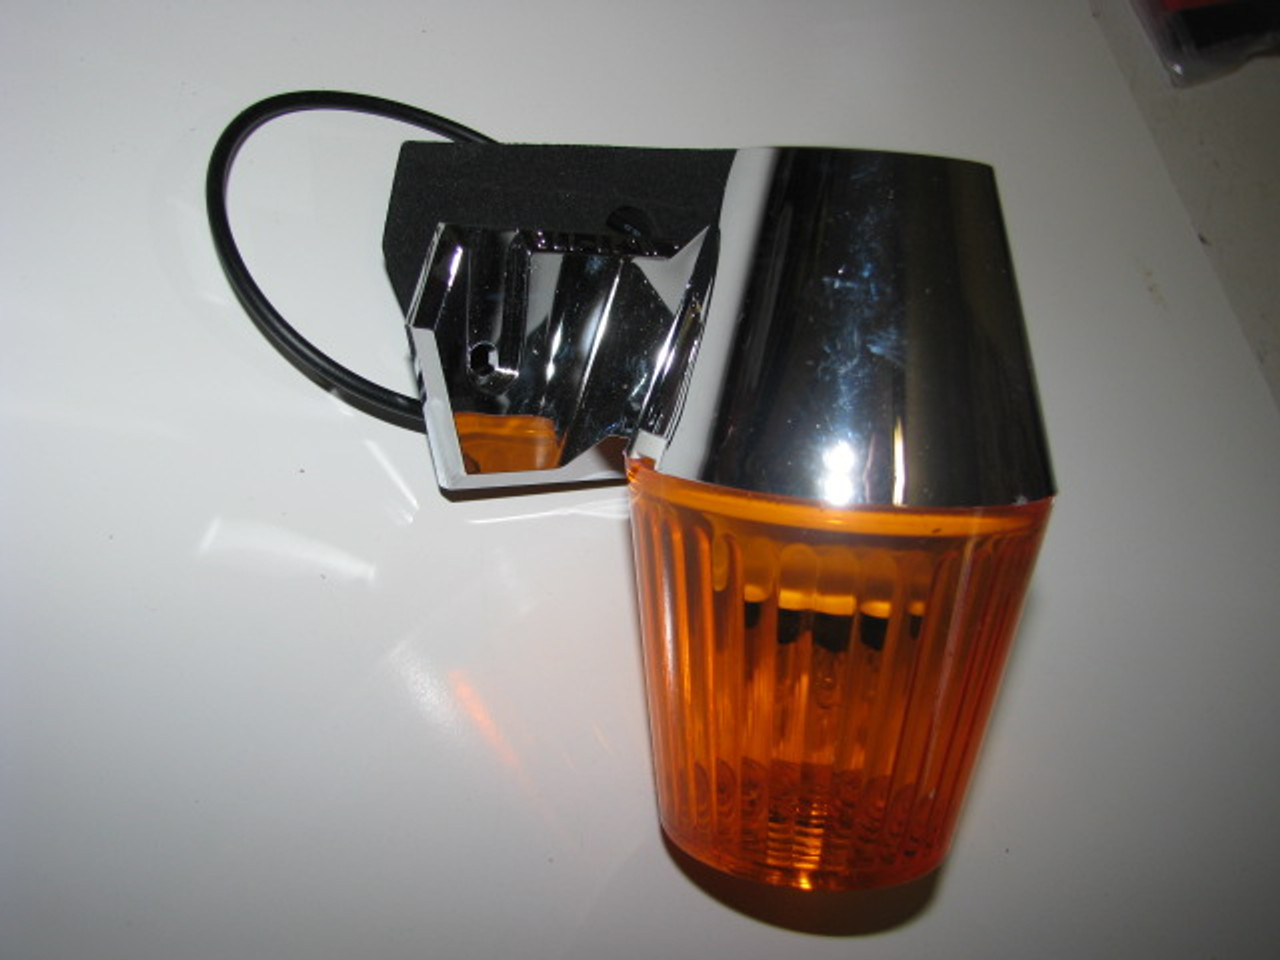 Porch Light with Amber lens (12 Volt) (CLT018)